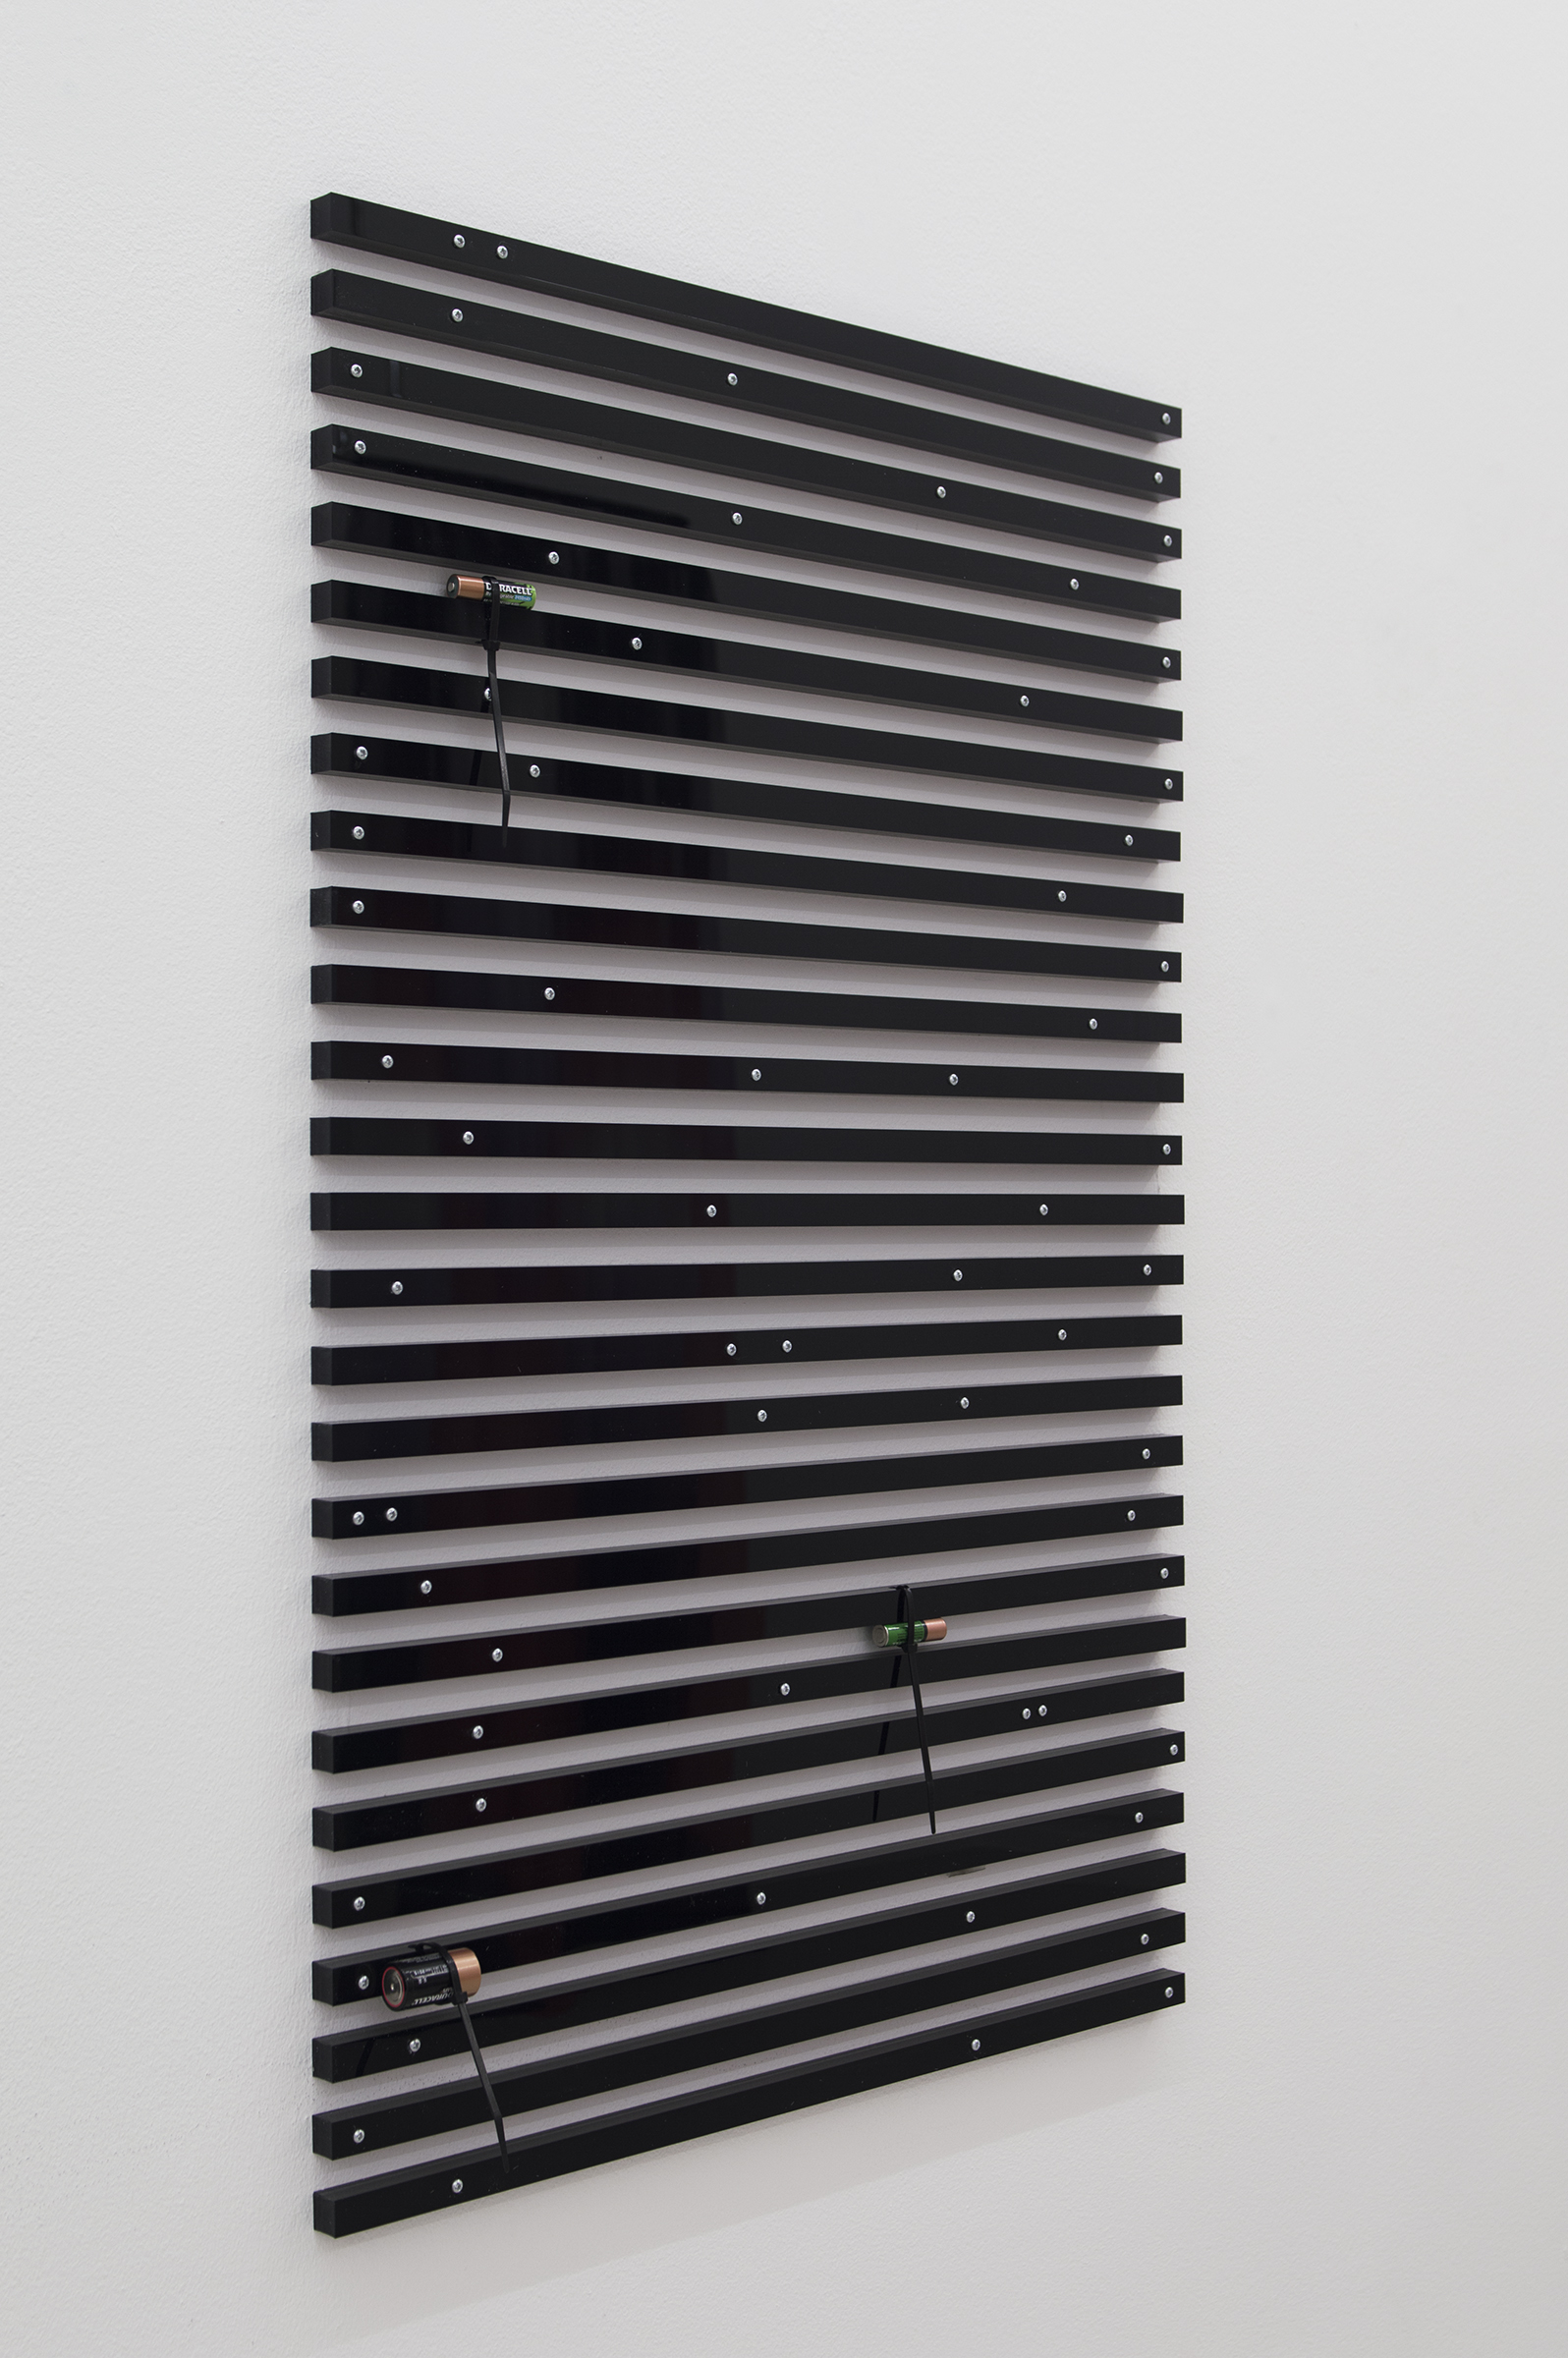 Vitality Maze ,2017 105 x 66 cm Plexiglass, steel, and batteries